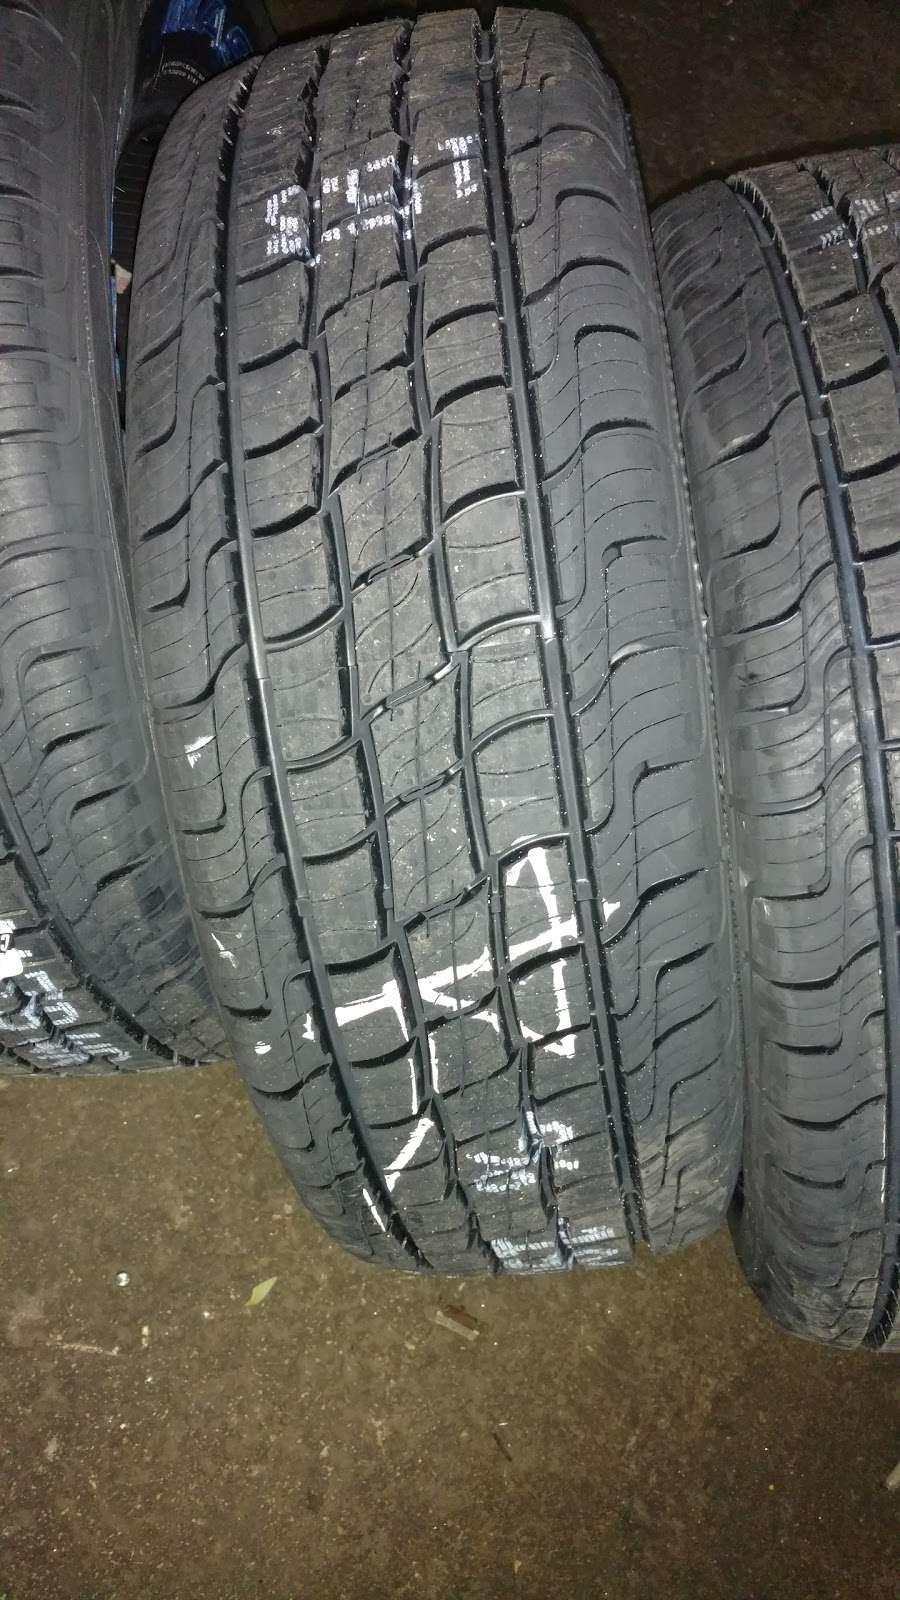 T M Tire Co Inc - car repair  | Photo 2 of 4 | Address: 4201 W Midlothian Turnpike, Midlothian, IL 60445, USA | Phone: (708) 597-3078